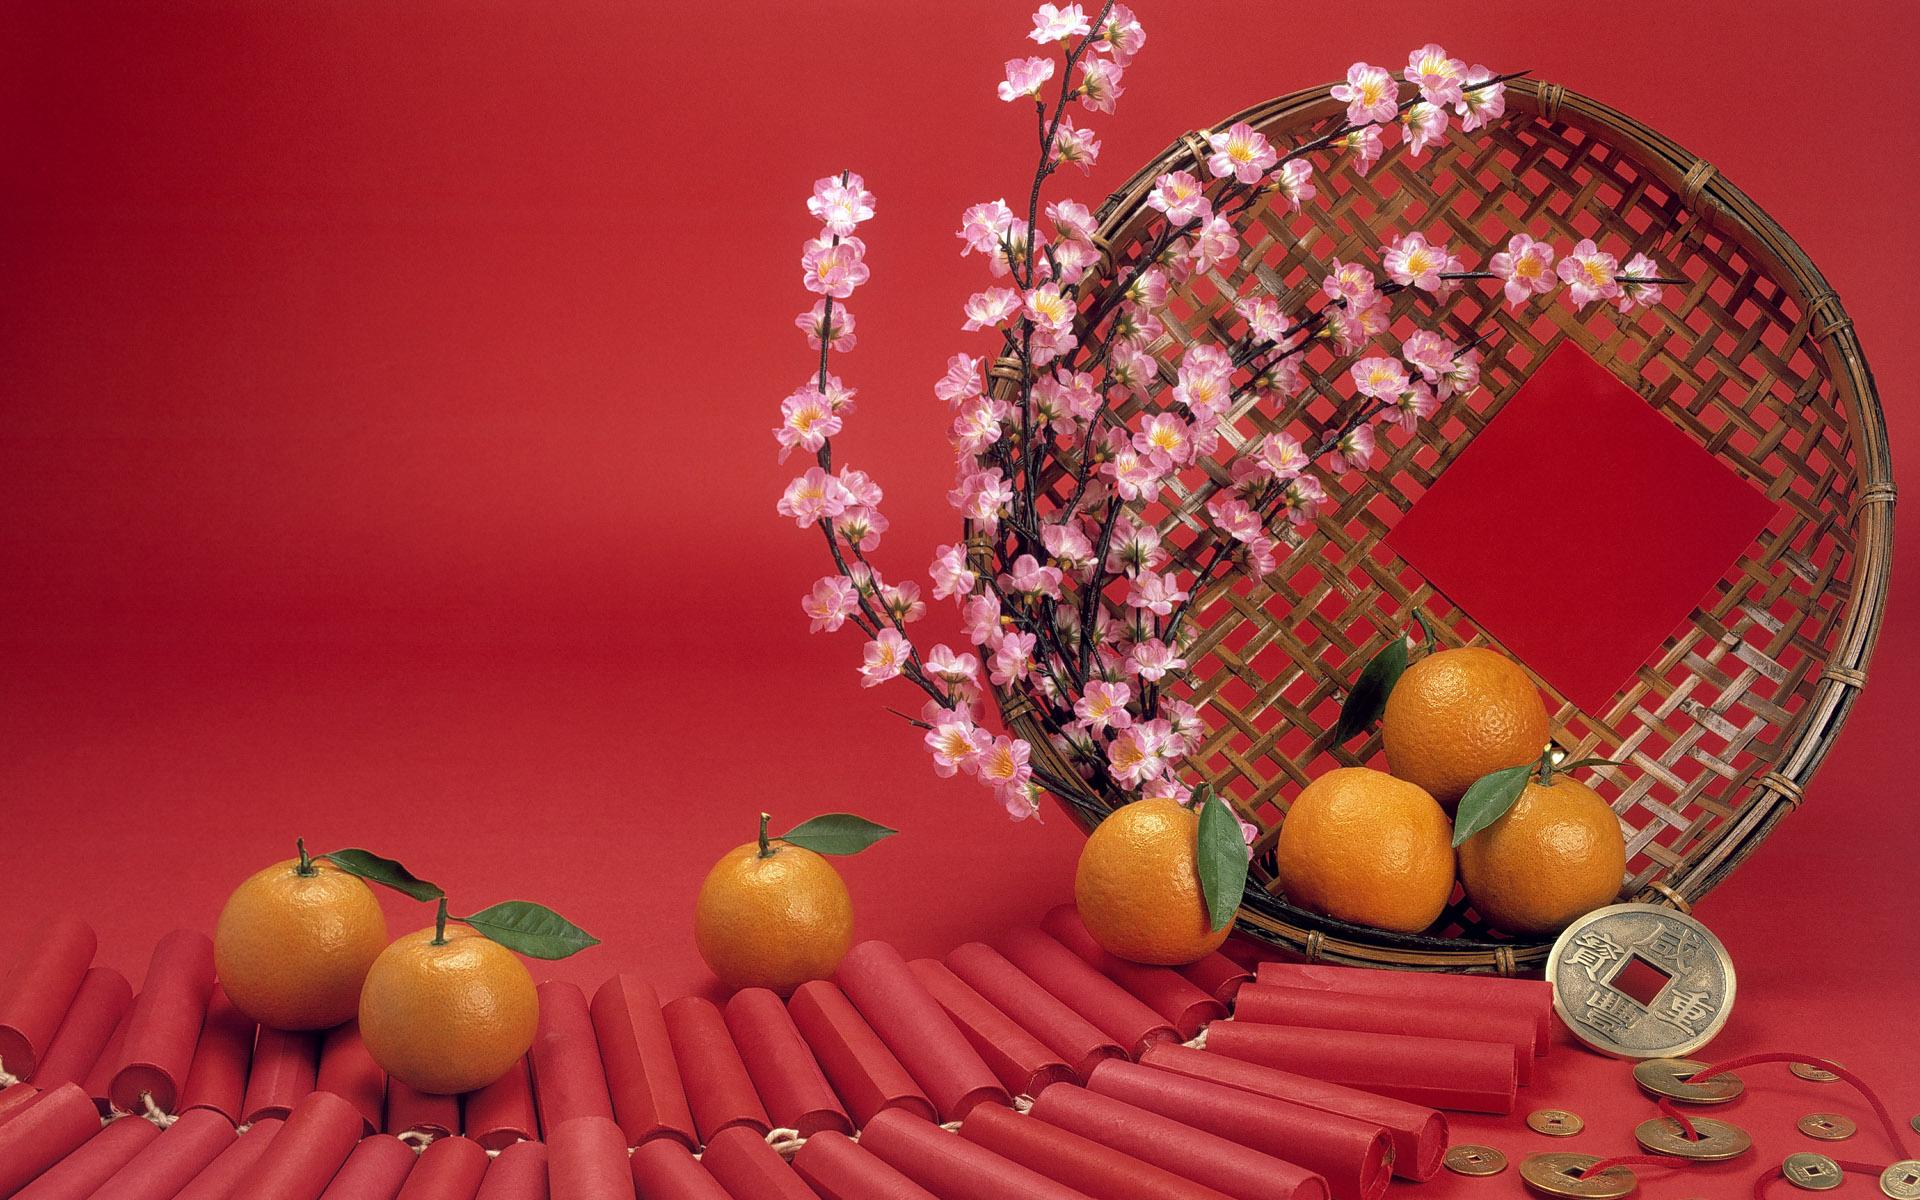 2015 Chinese New Year Wallpaper PC 15321 Wallpaper Wallpaper Screen 1920x1200